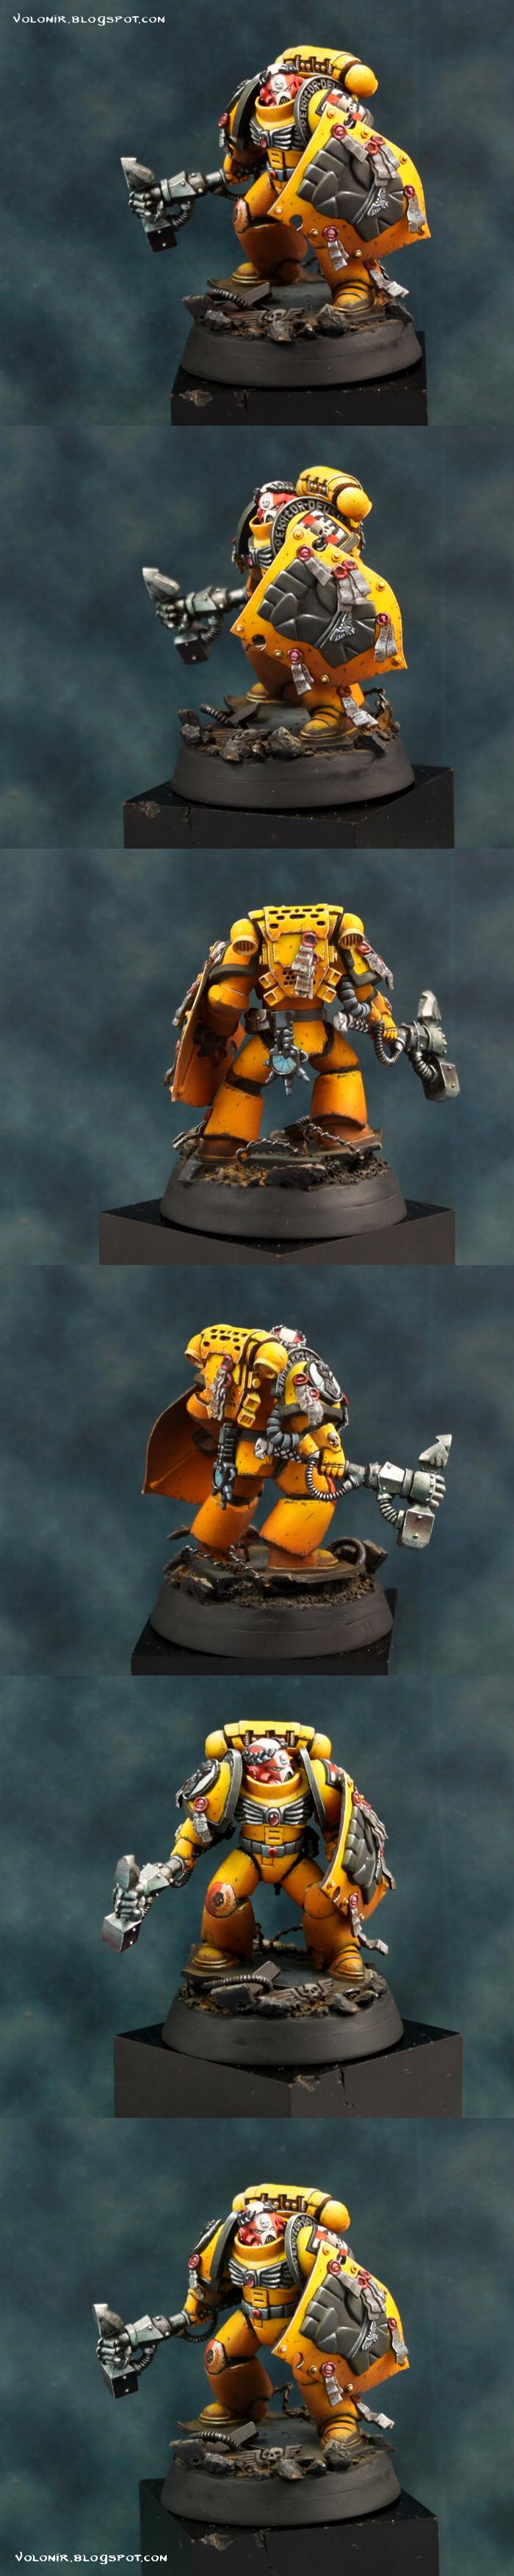 Artscale Imperial Fist Deathwatch